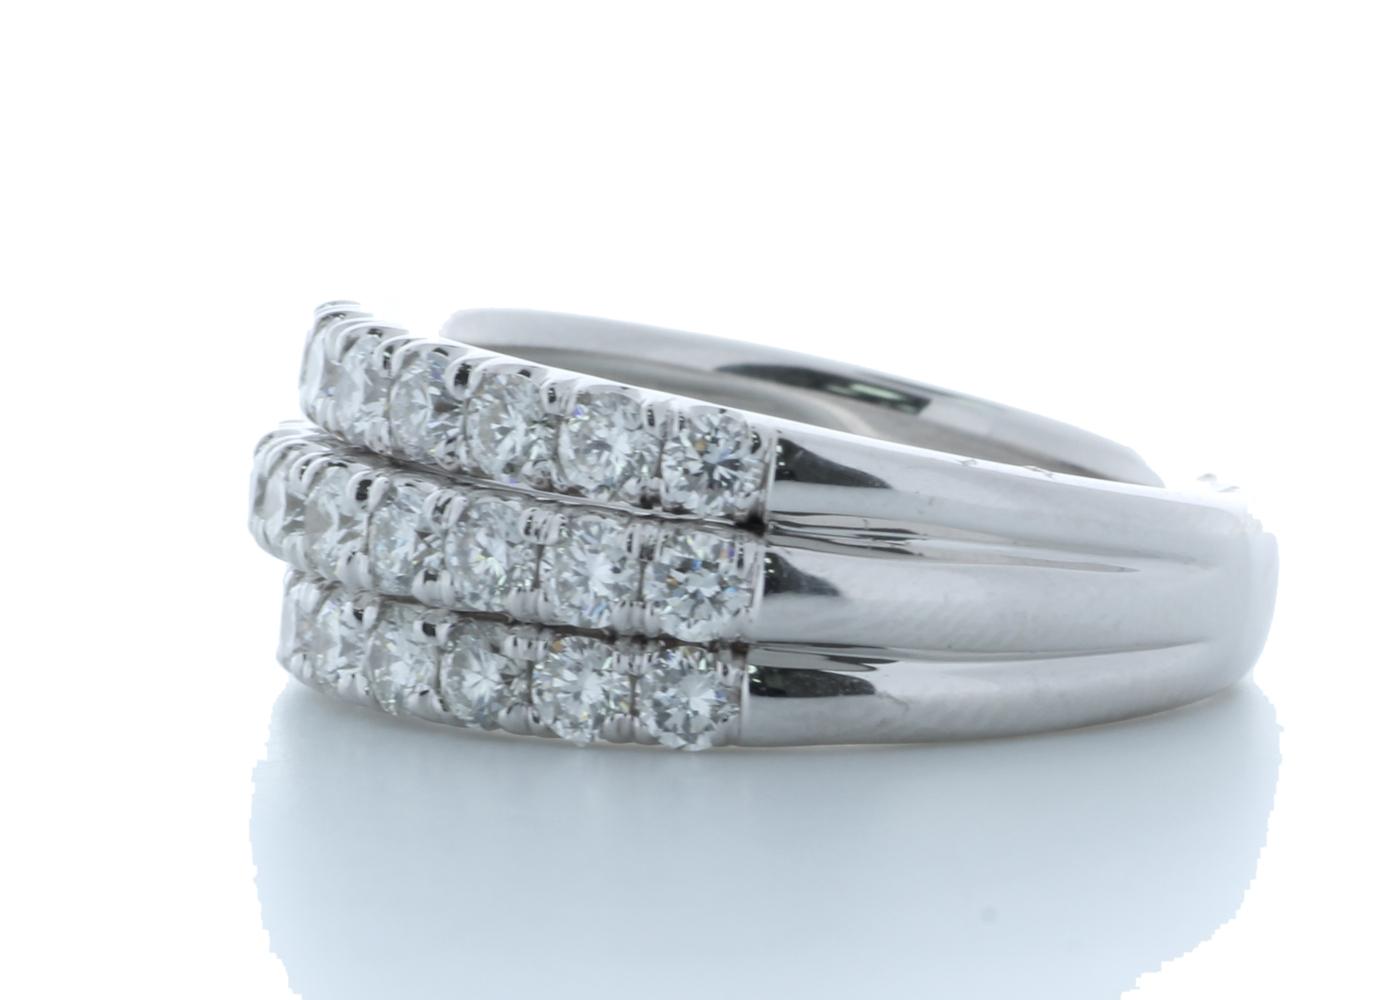 18k White Gold Channel Set Semi Eternity Diamond Ring 1.61 Carats - Image 2 of 4